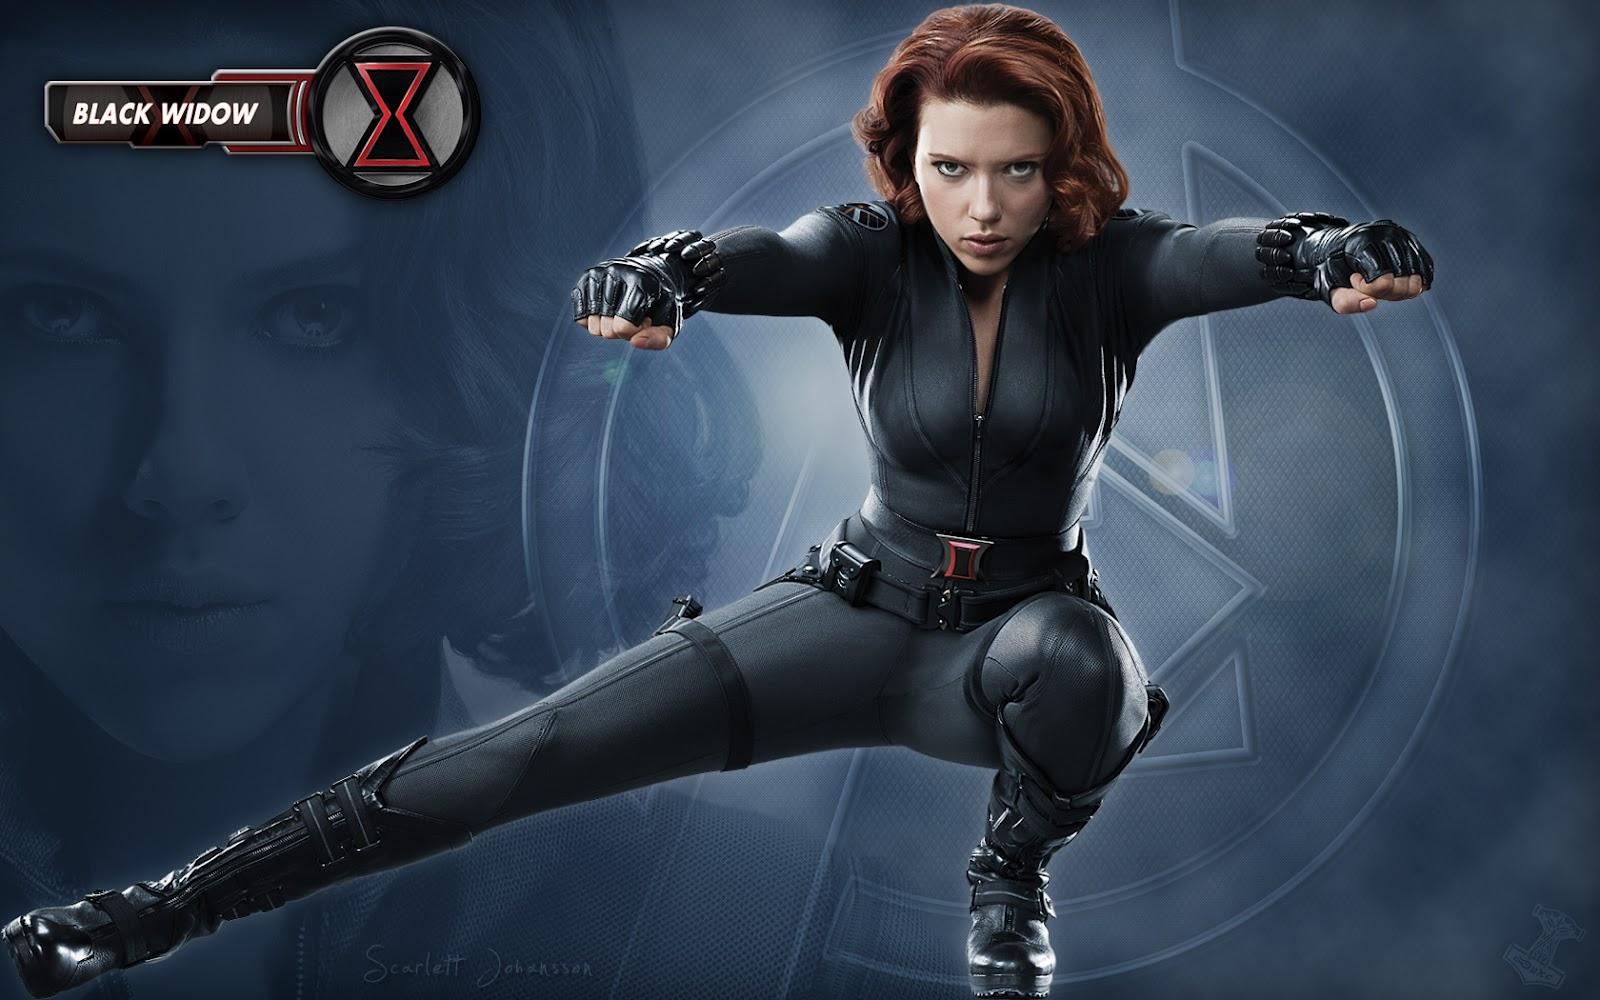 High Quality Hds Pics Of Scarlett Johansson As Redhead: Black Widow Wallpapers Scarlett Johansson